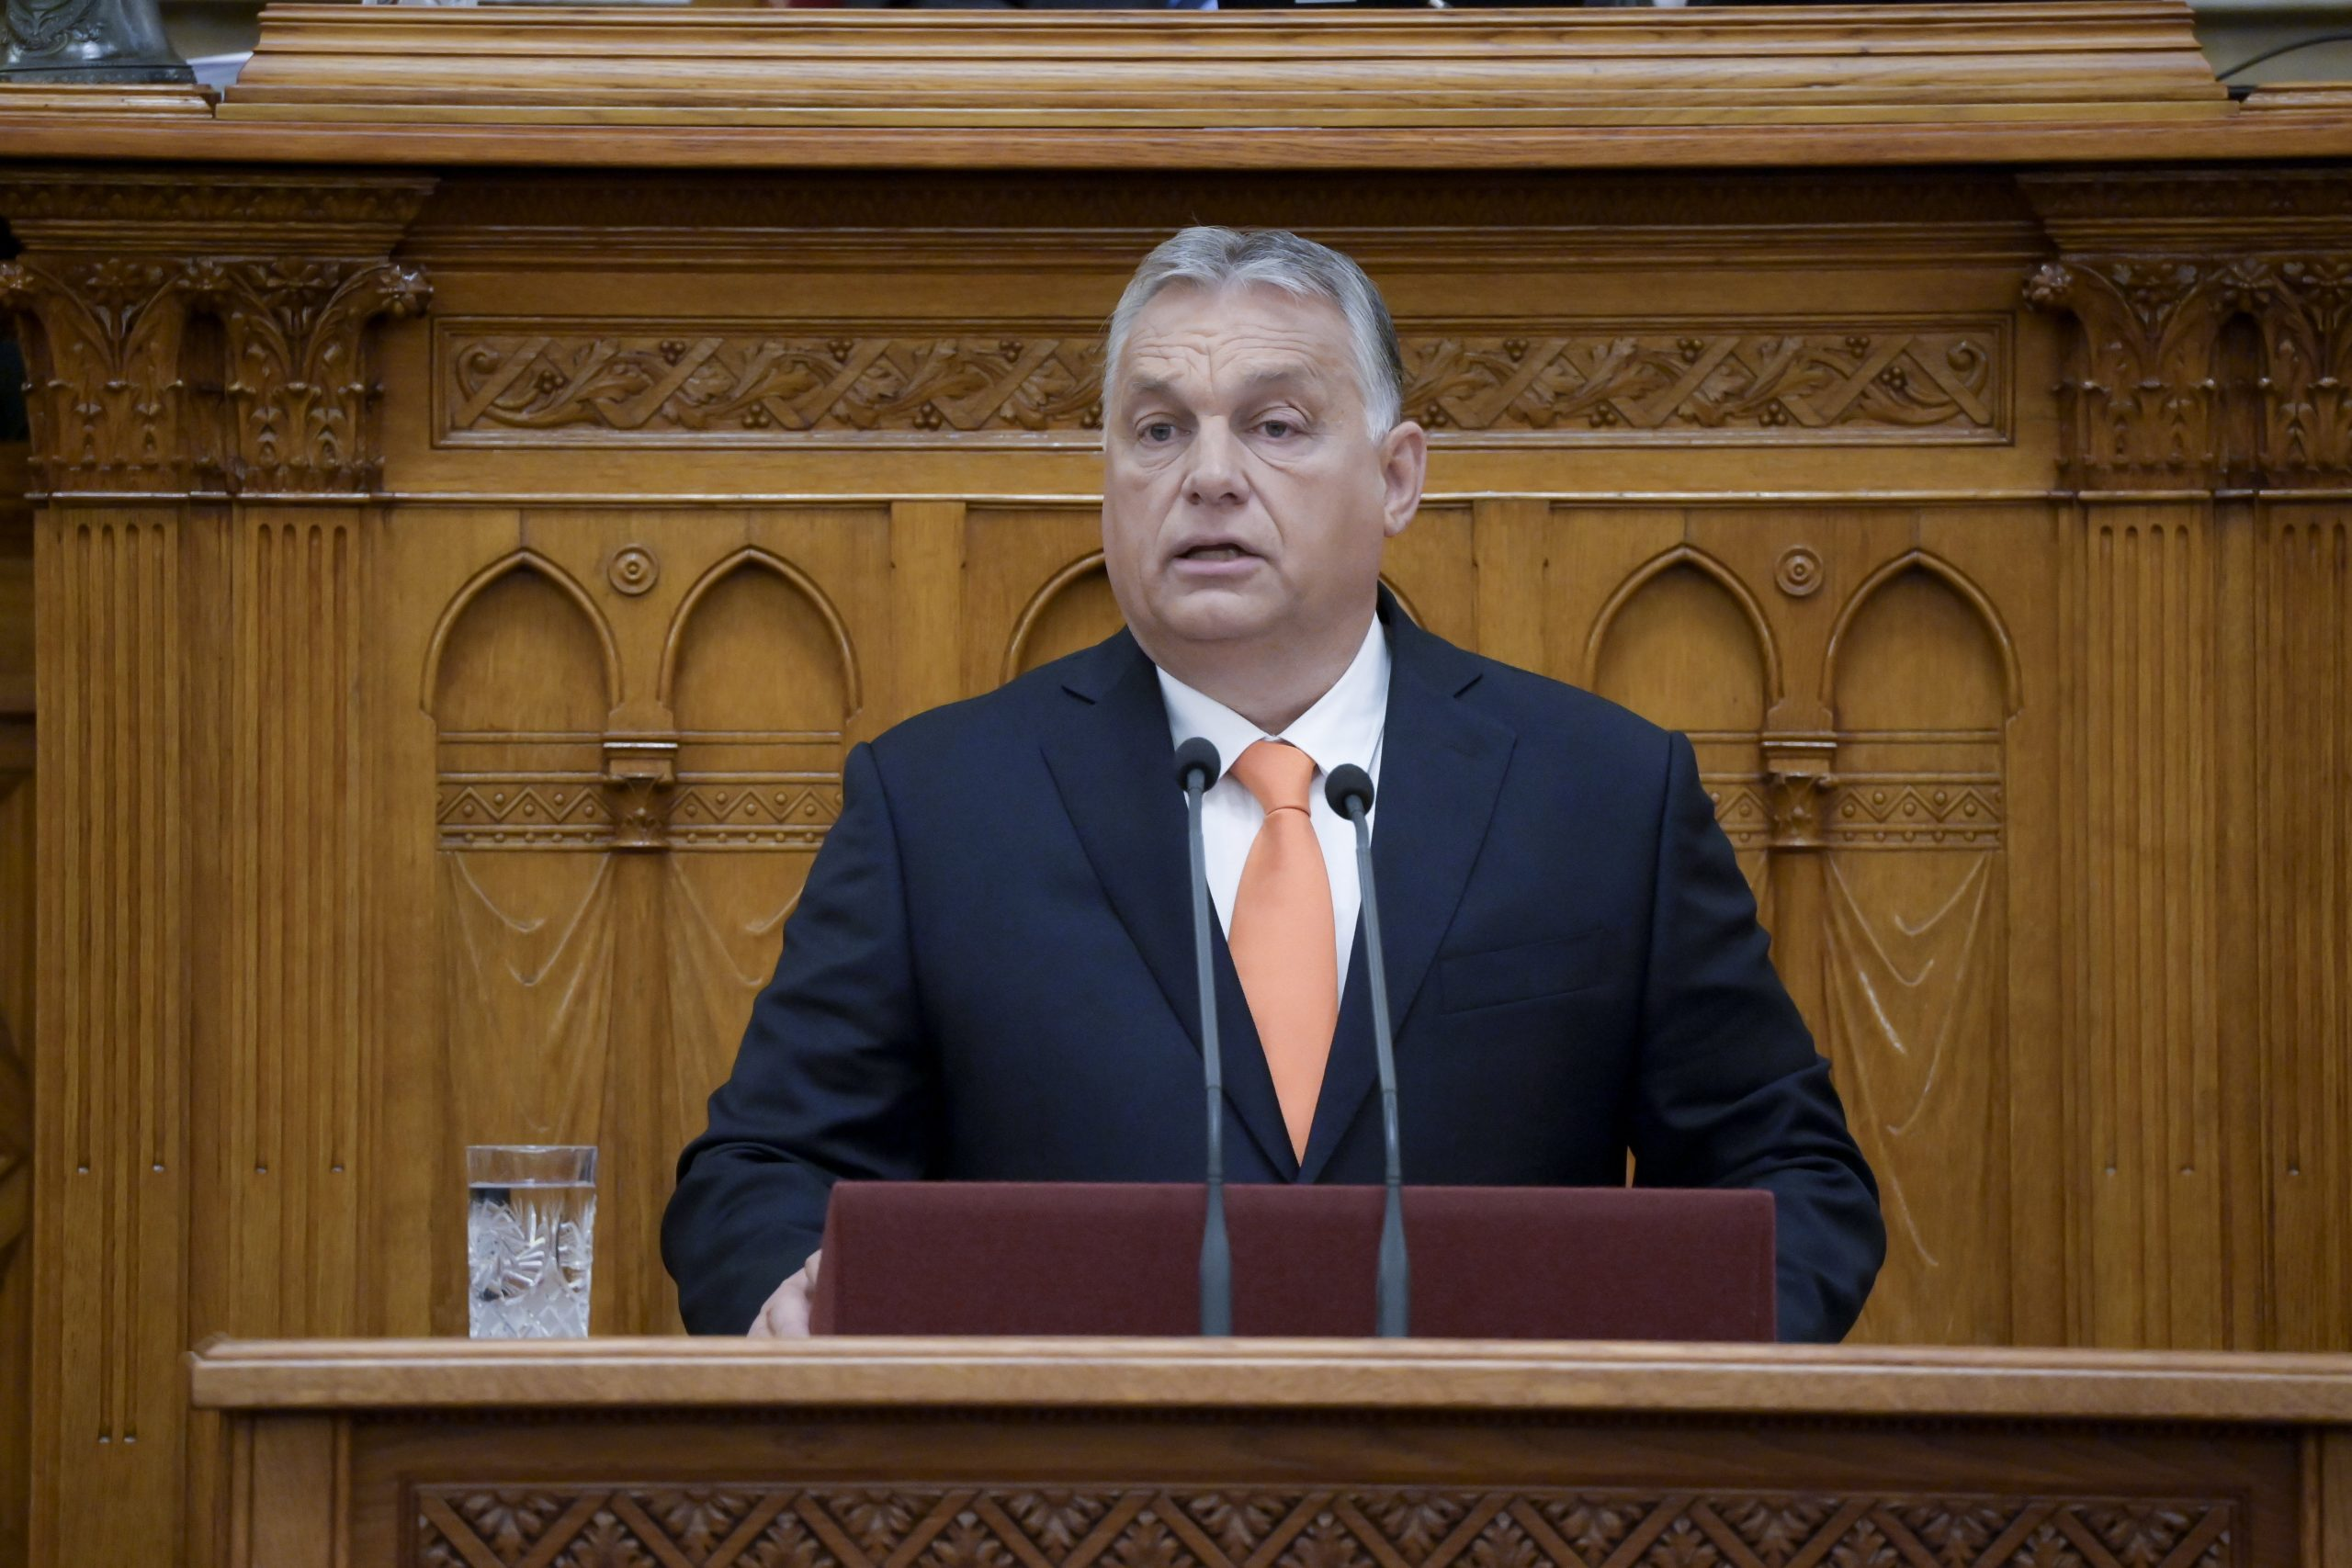 PM Orbán Congratulates New Austrian Chancellor Schallenberg